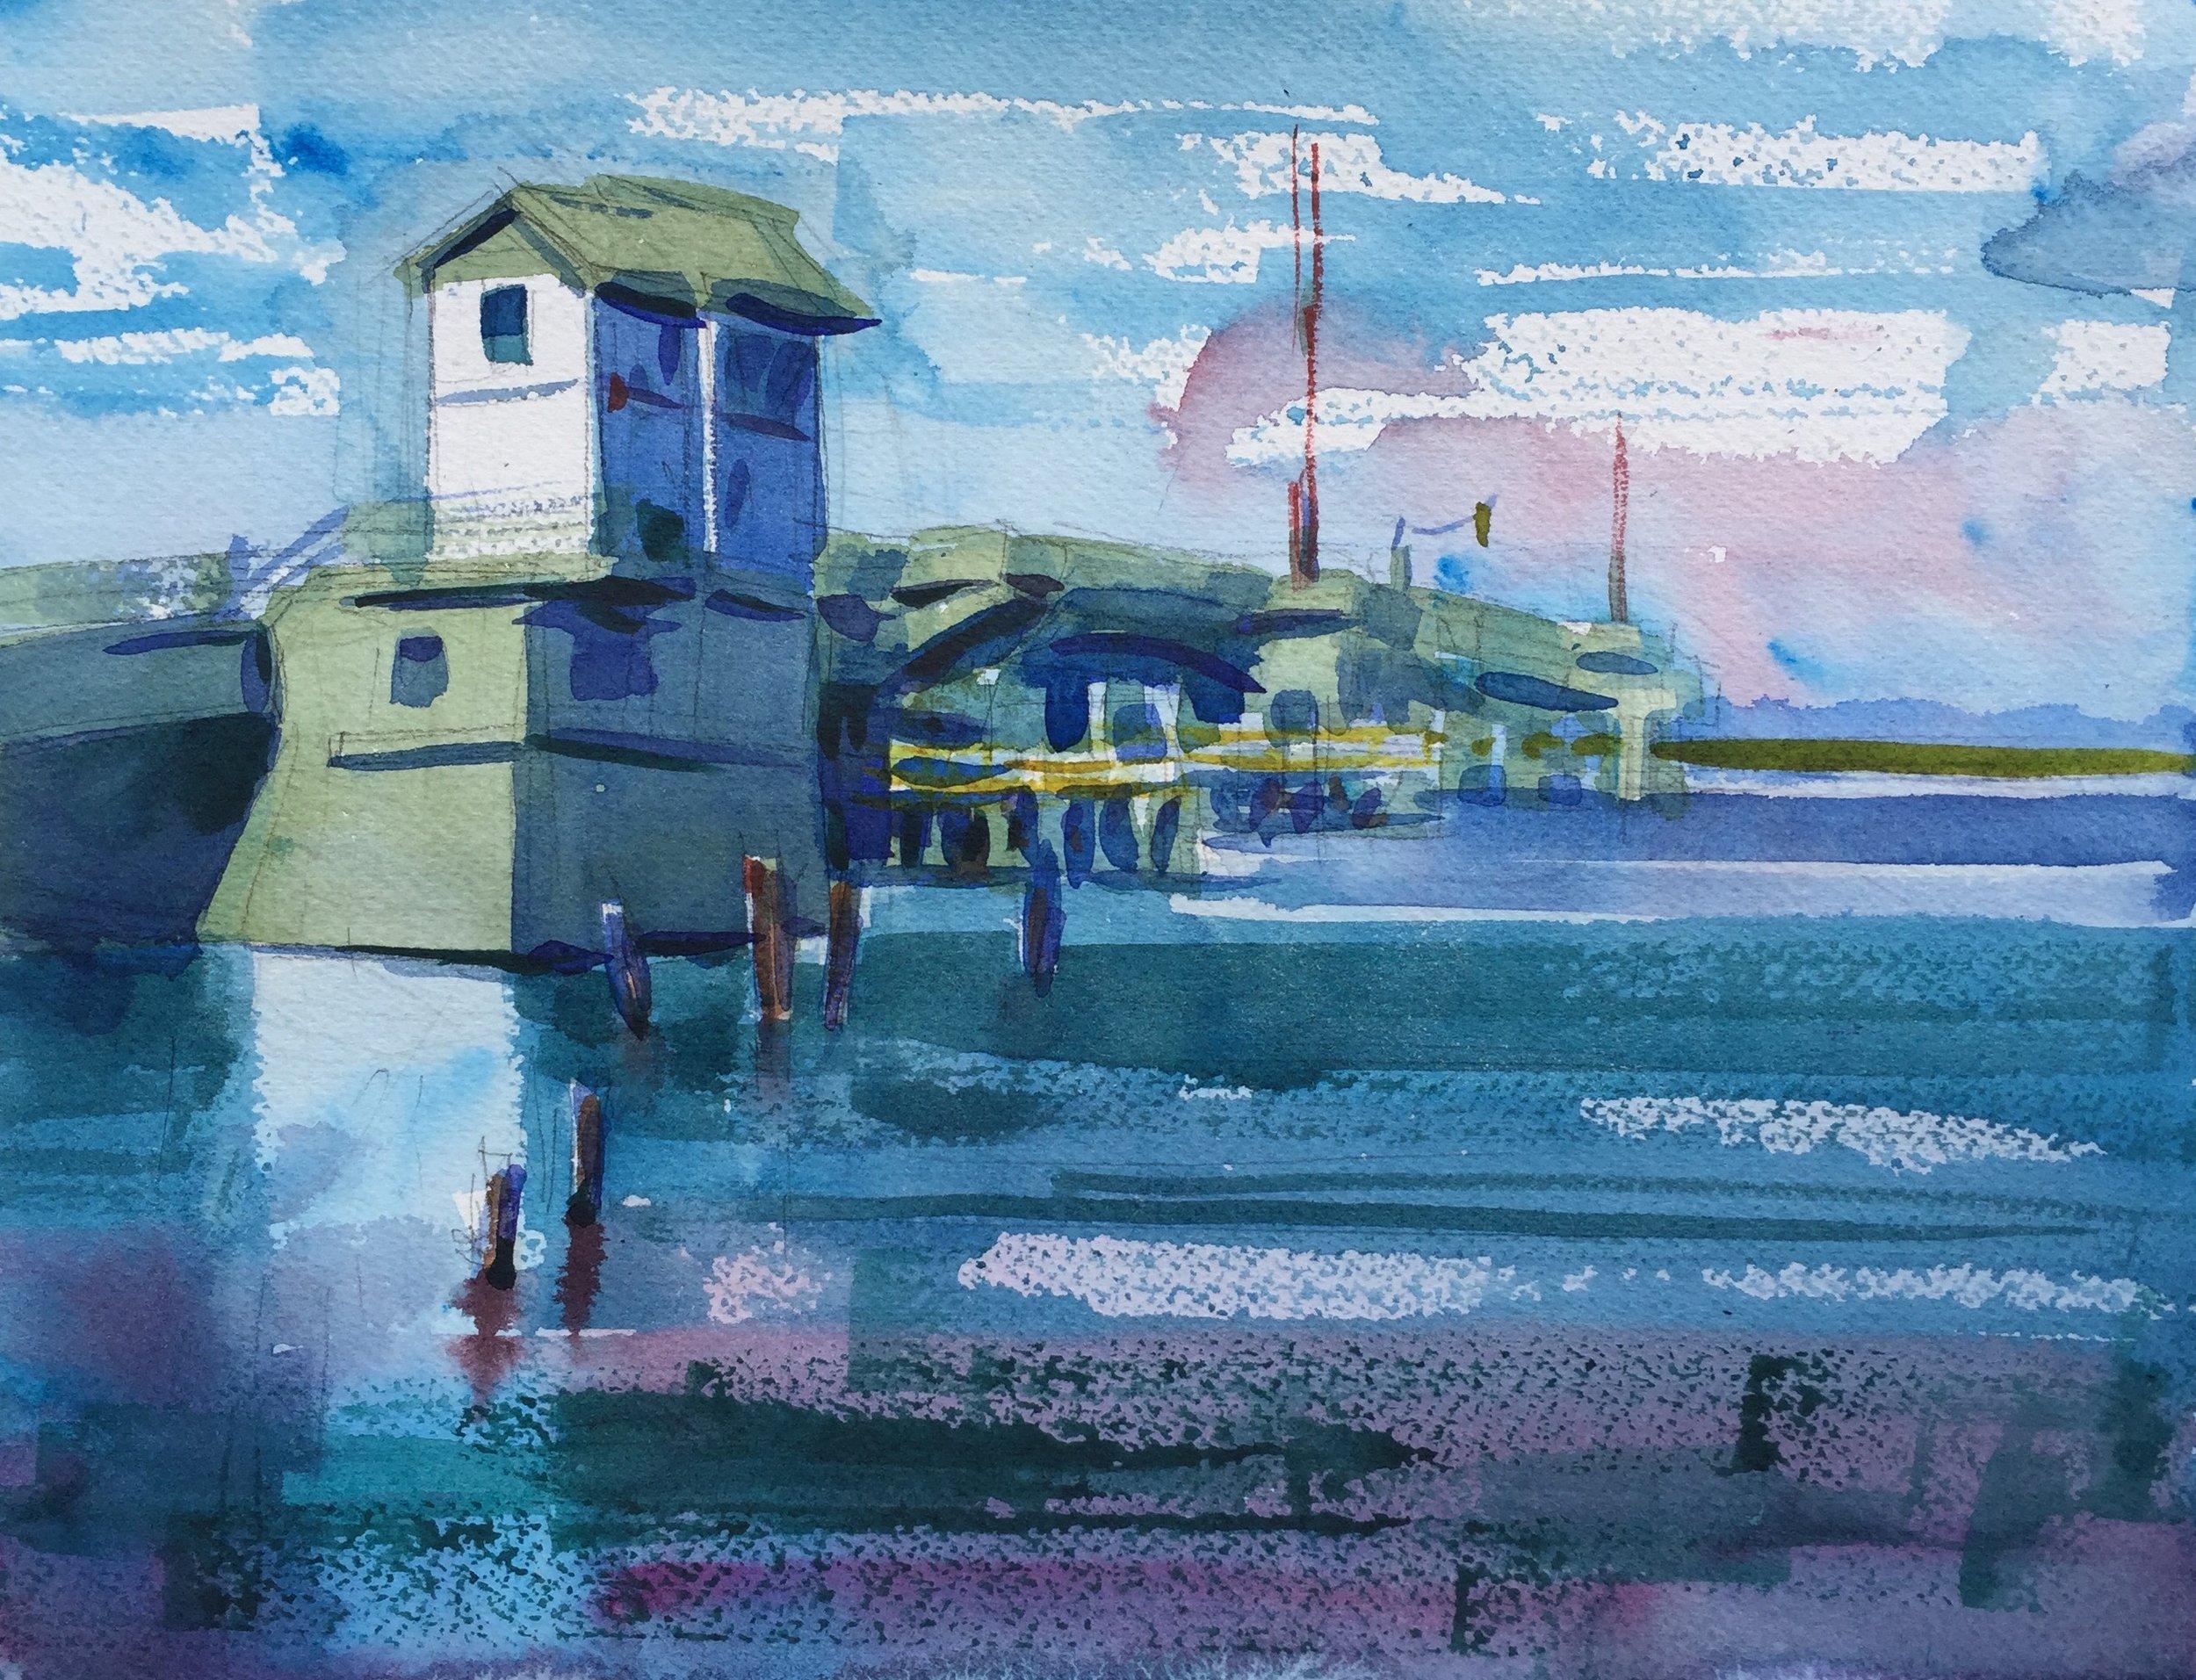 """Gatekeeper"" (Chincoteague, VA) 9"" x 12"", 2016 Sold"